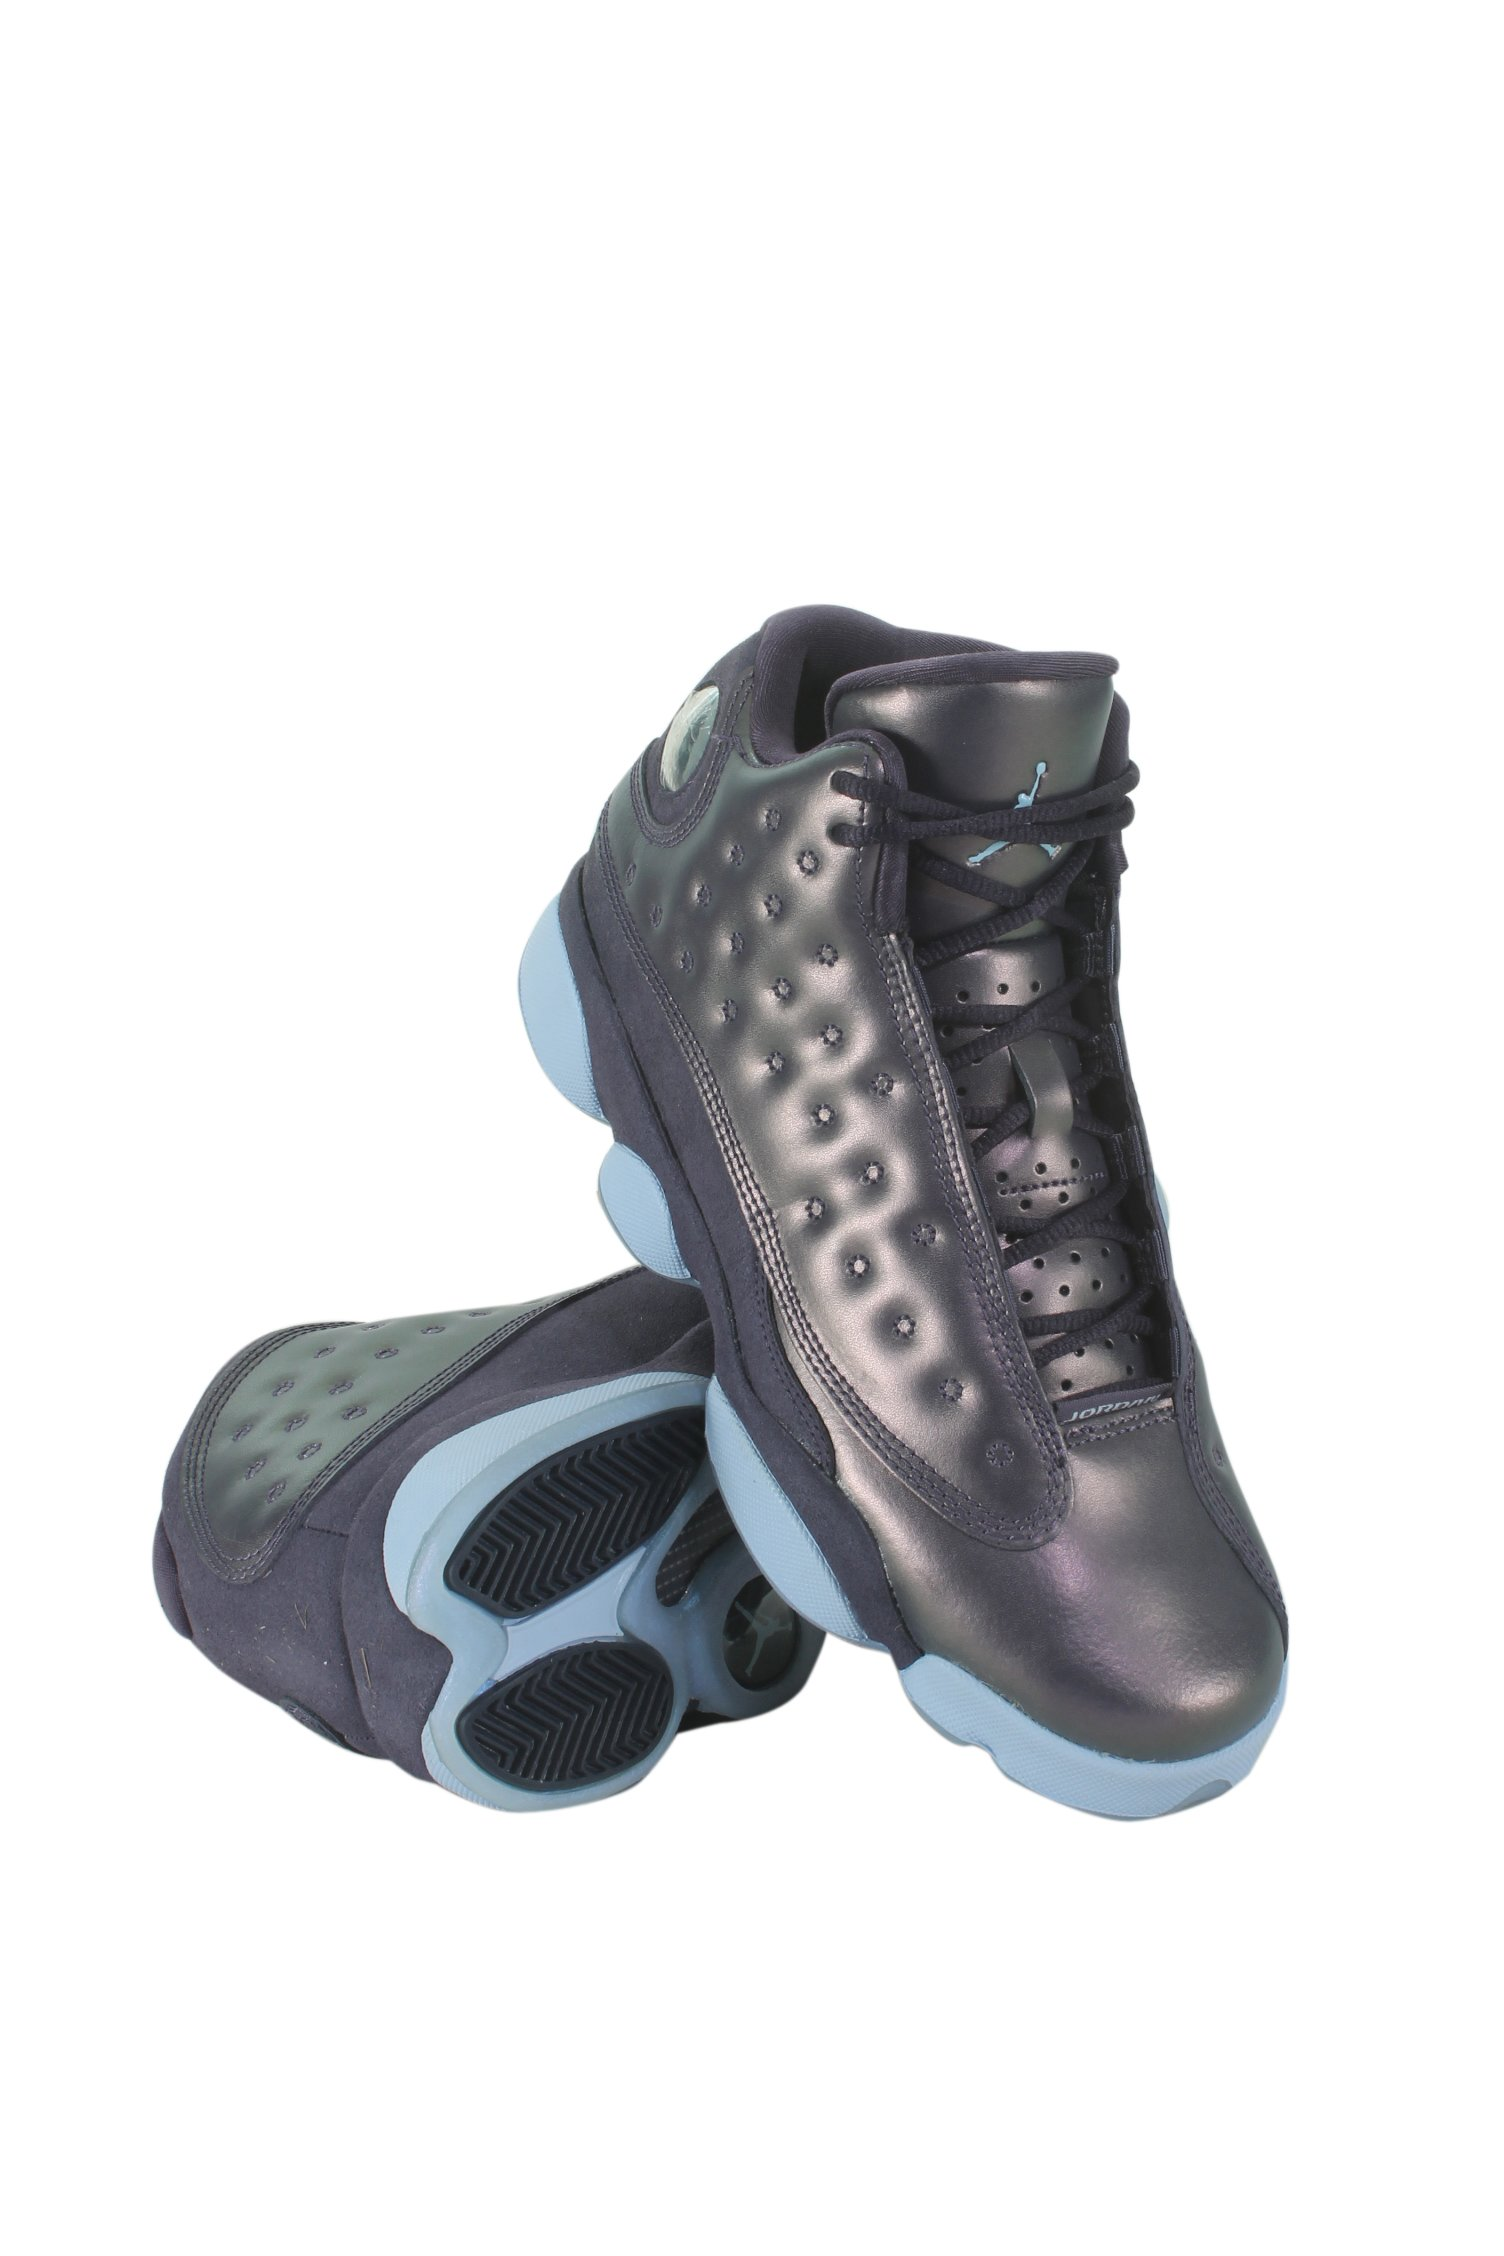 Jordan Retro 13'' Dark Raisin Premium Dark Raisin/Hydrogen Blue (GS) (7)